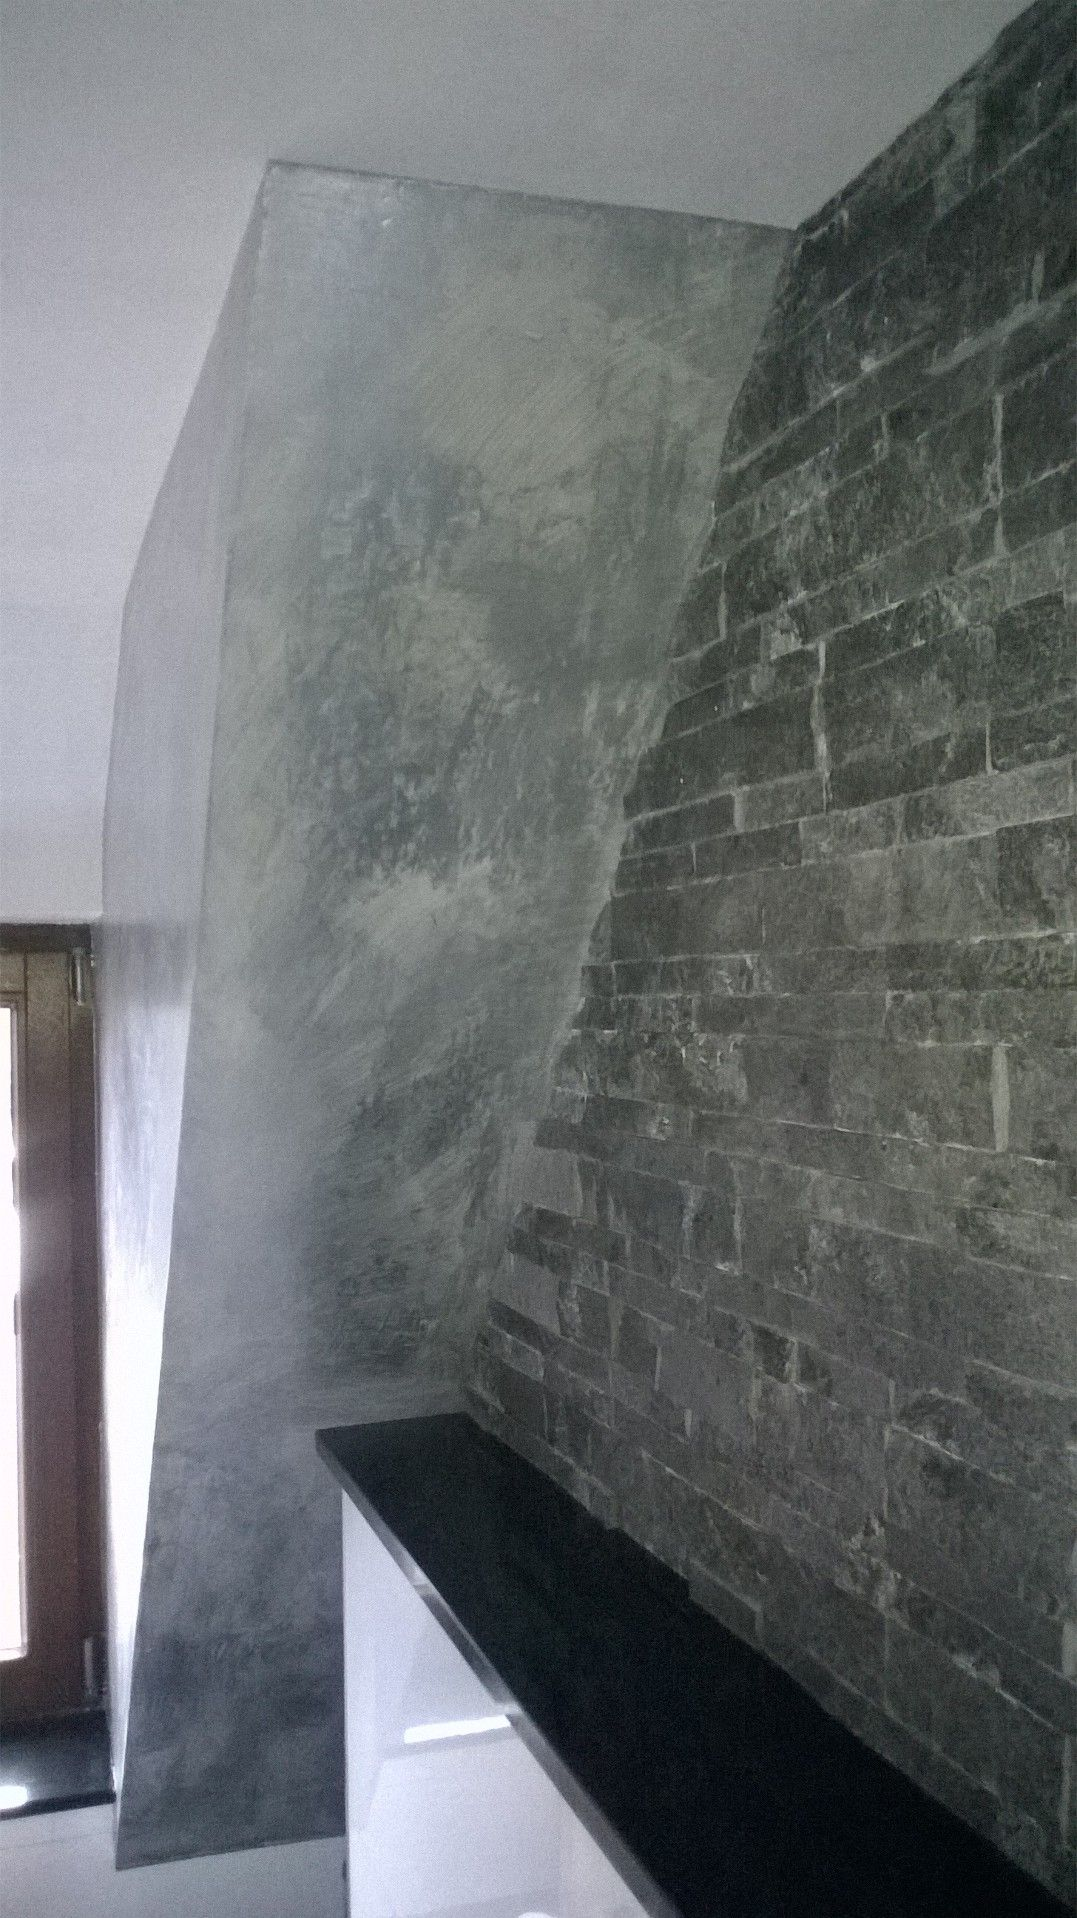 Badgestaltung eine wand in betonlook mit silberlasur veredelt volimea wandbeschichtung made - Spachteltechnik wand ...